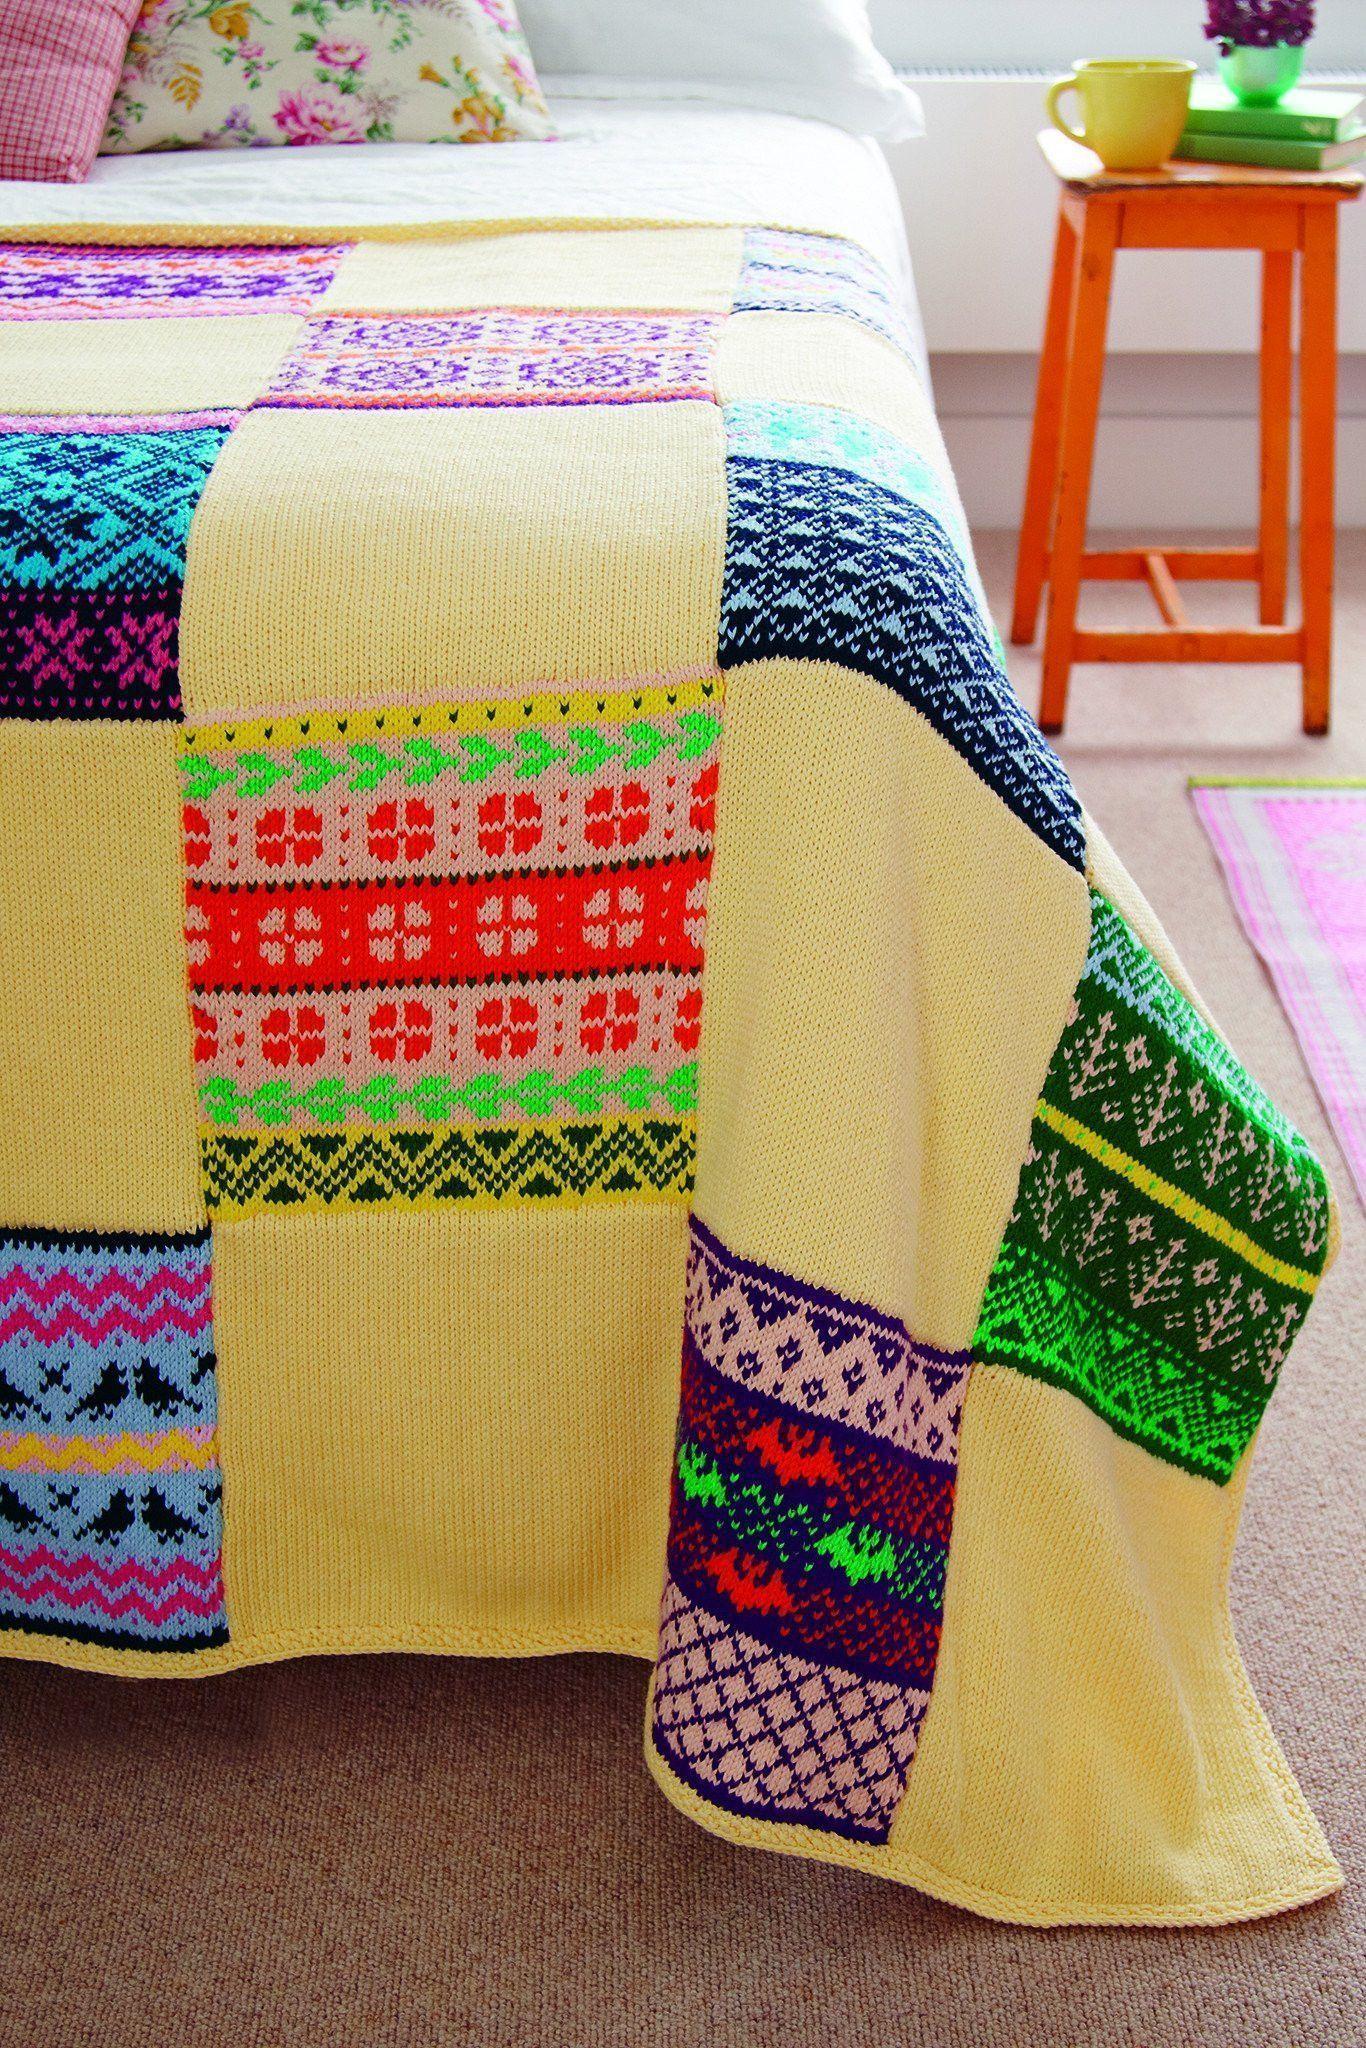 Fair Isle Square Blanket Knitting Pattern | The Knitting ...